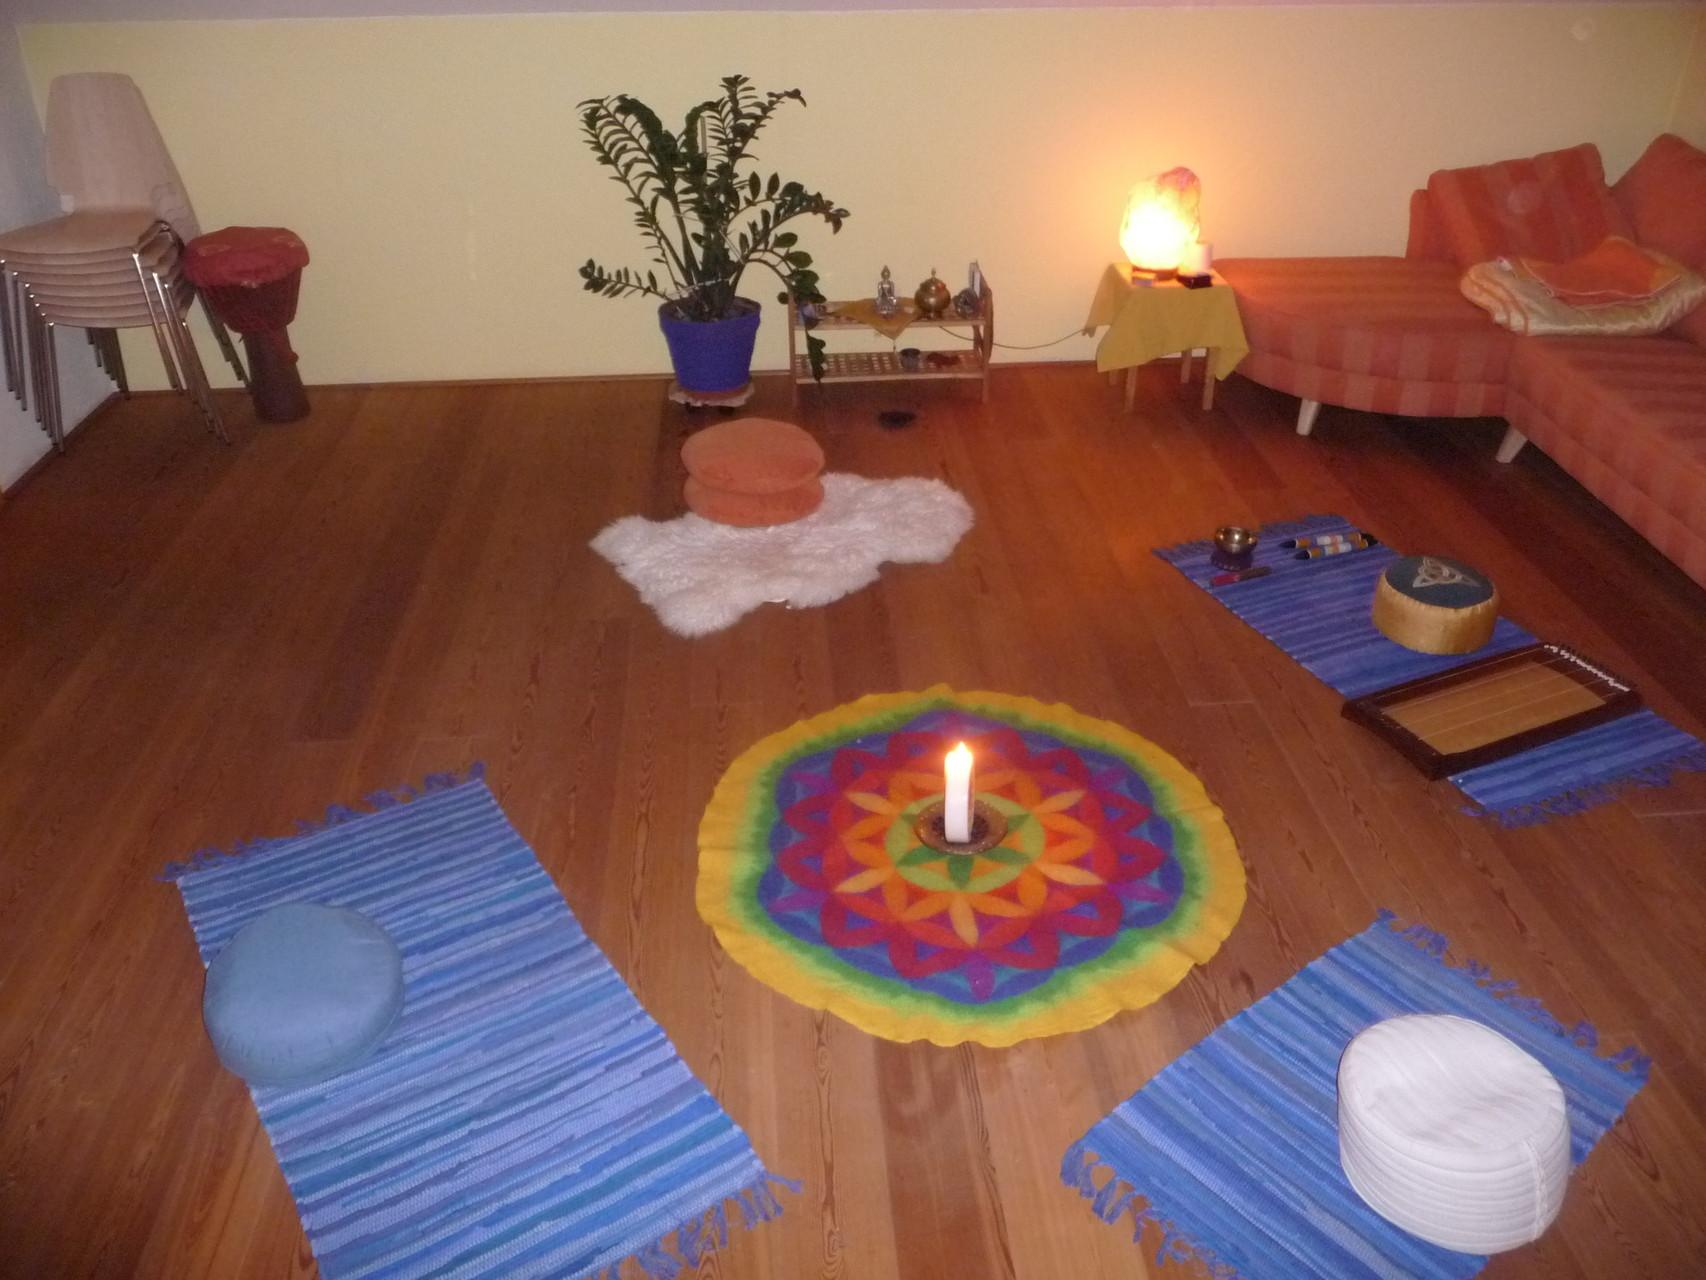 Meditations und Seminarraum